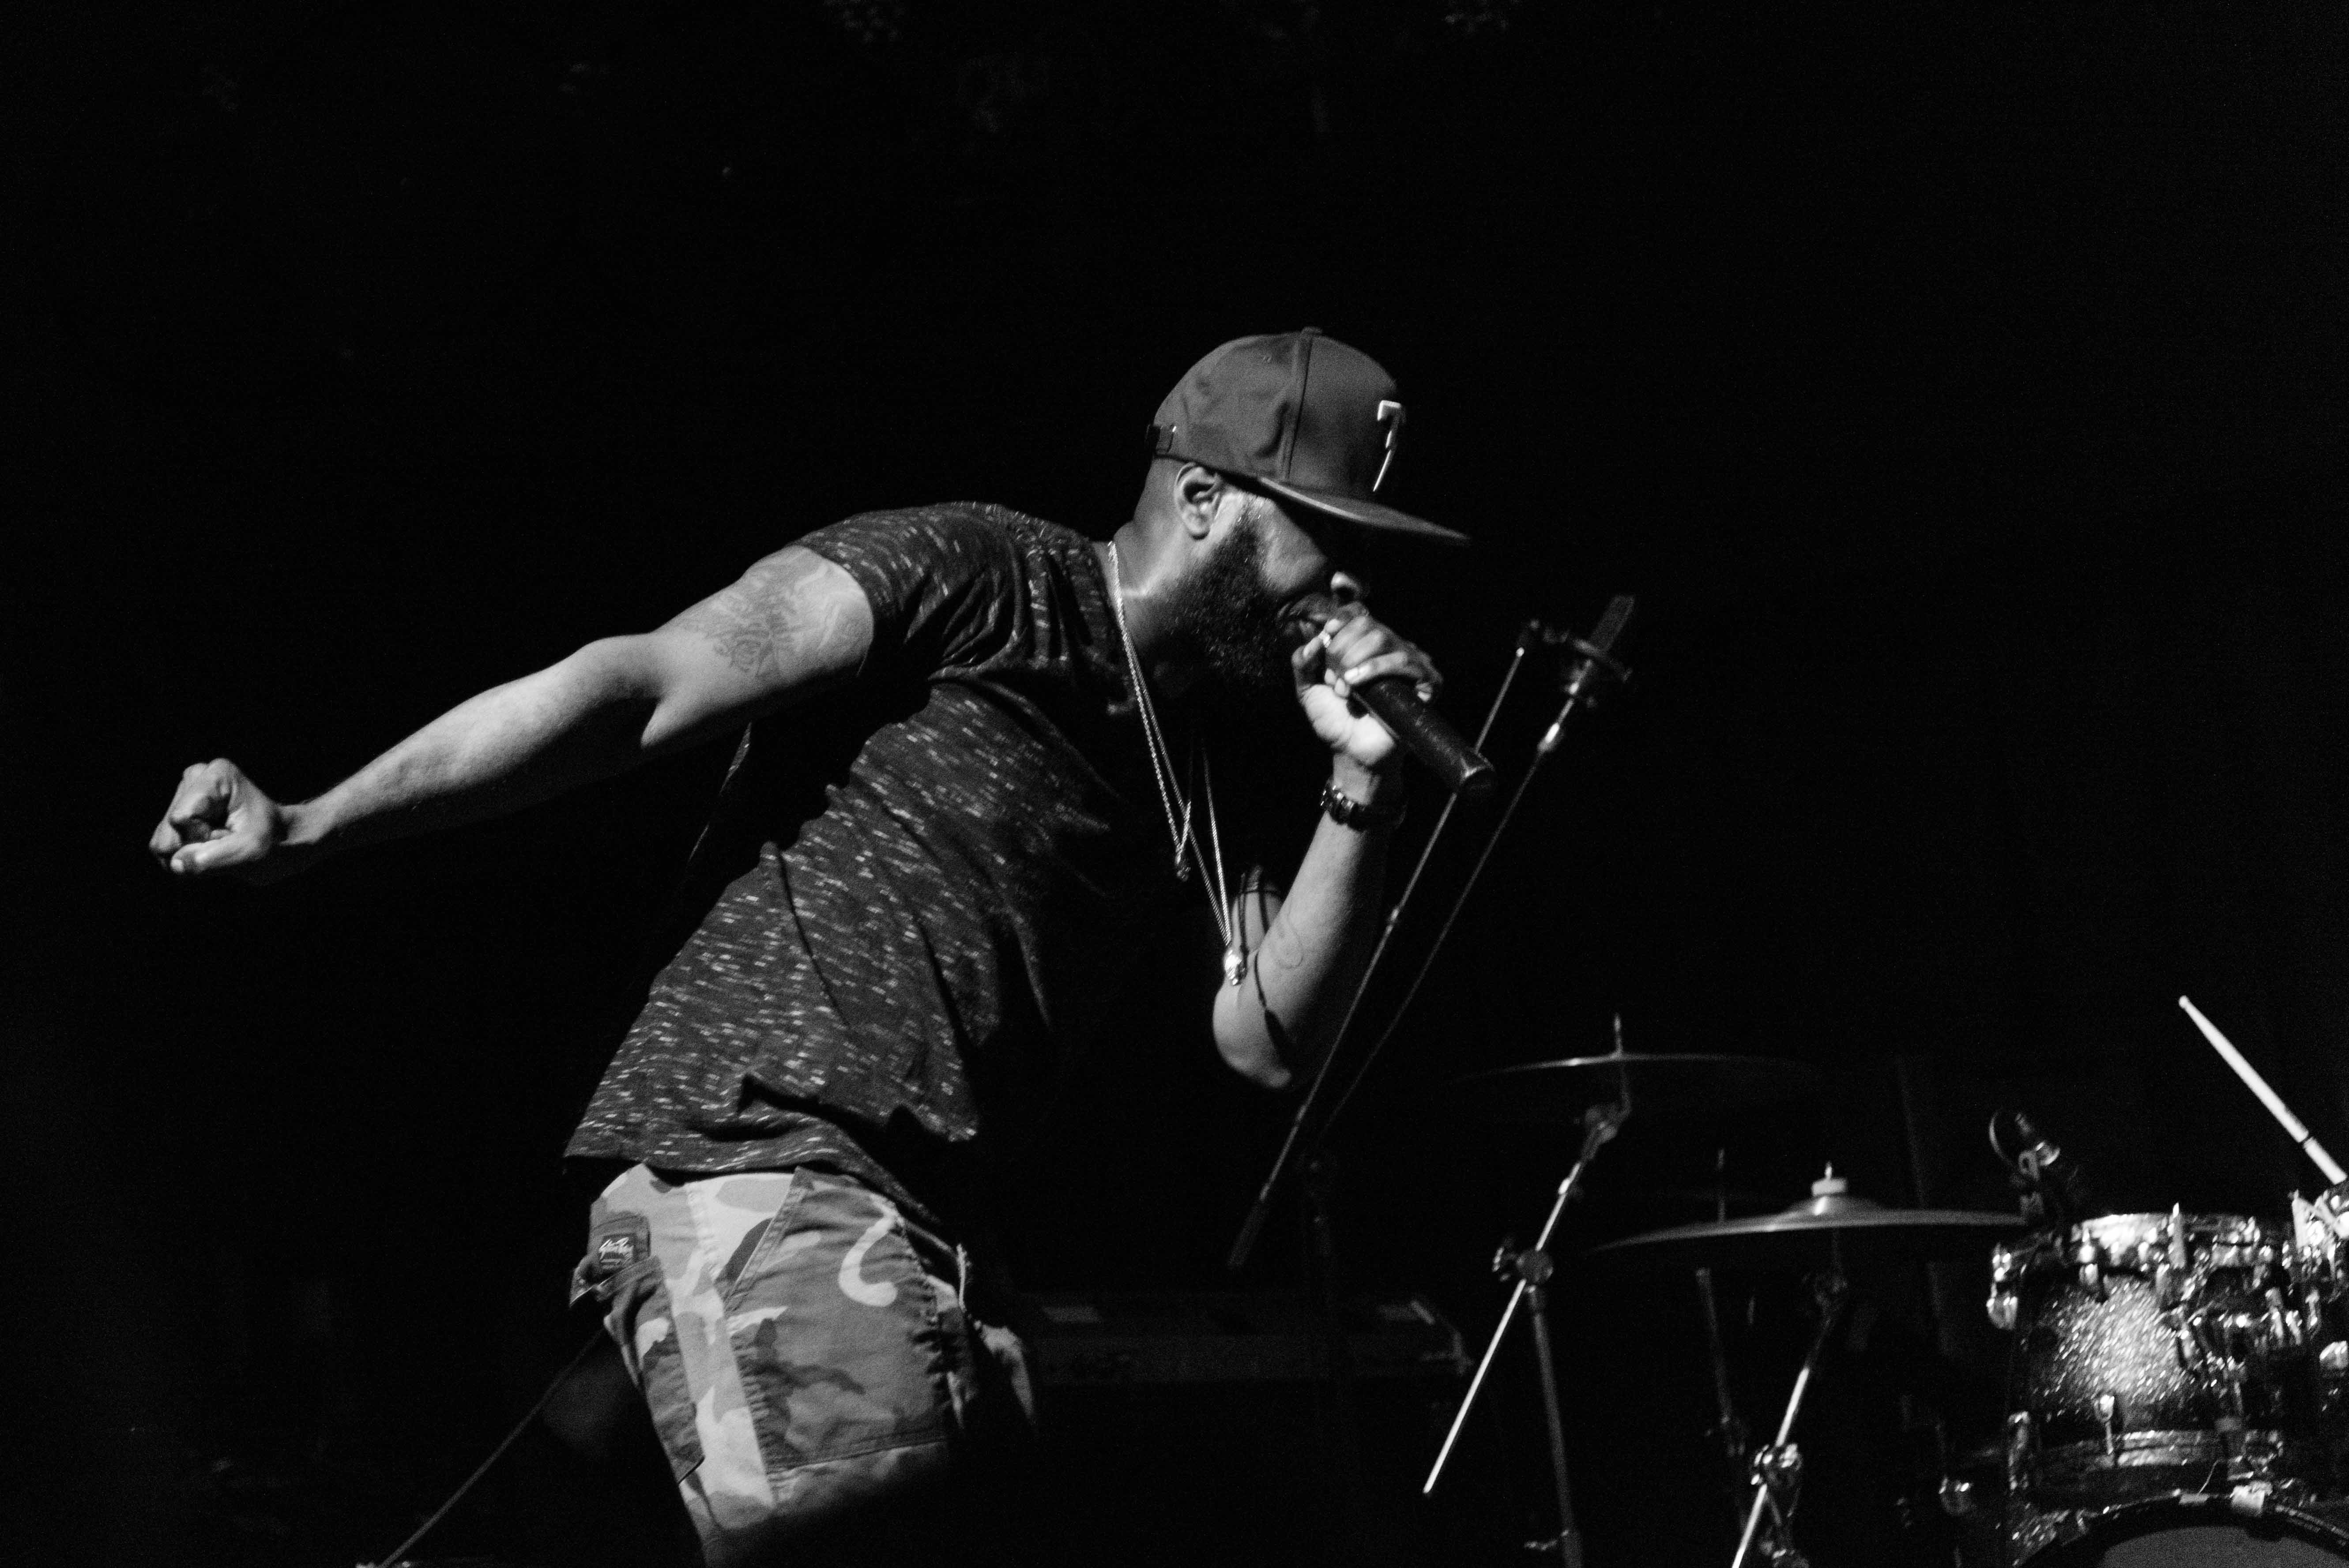 Talib Kweli, durante show no Brooklyn, em 2017. Foto: Vivian Wang